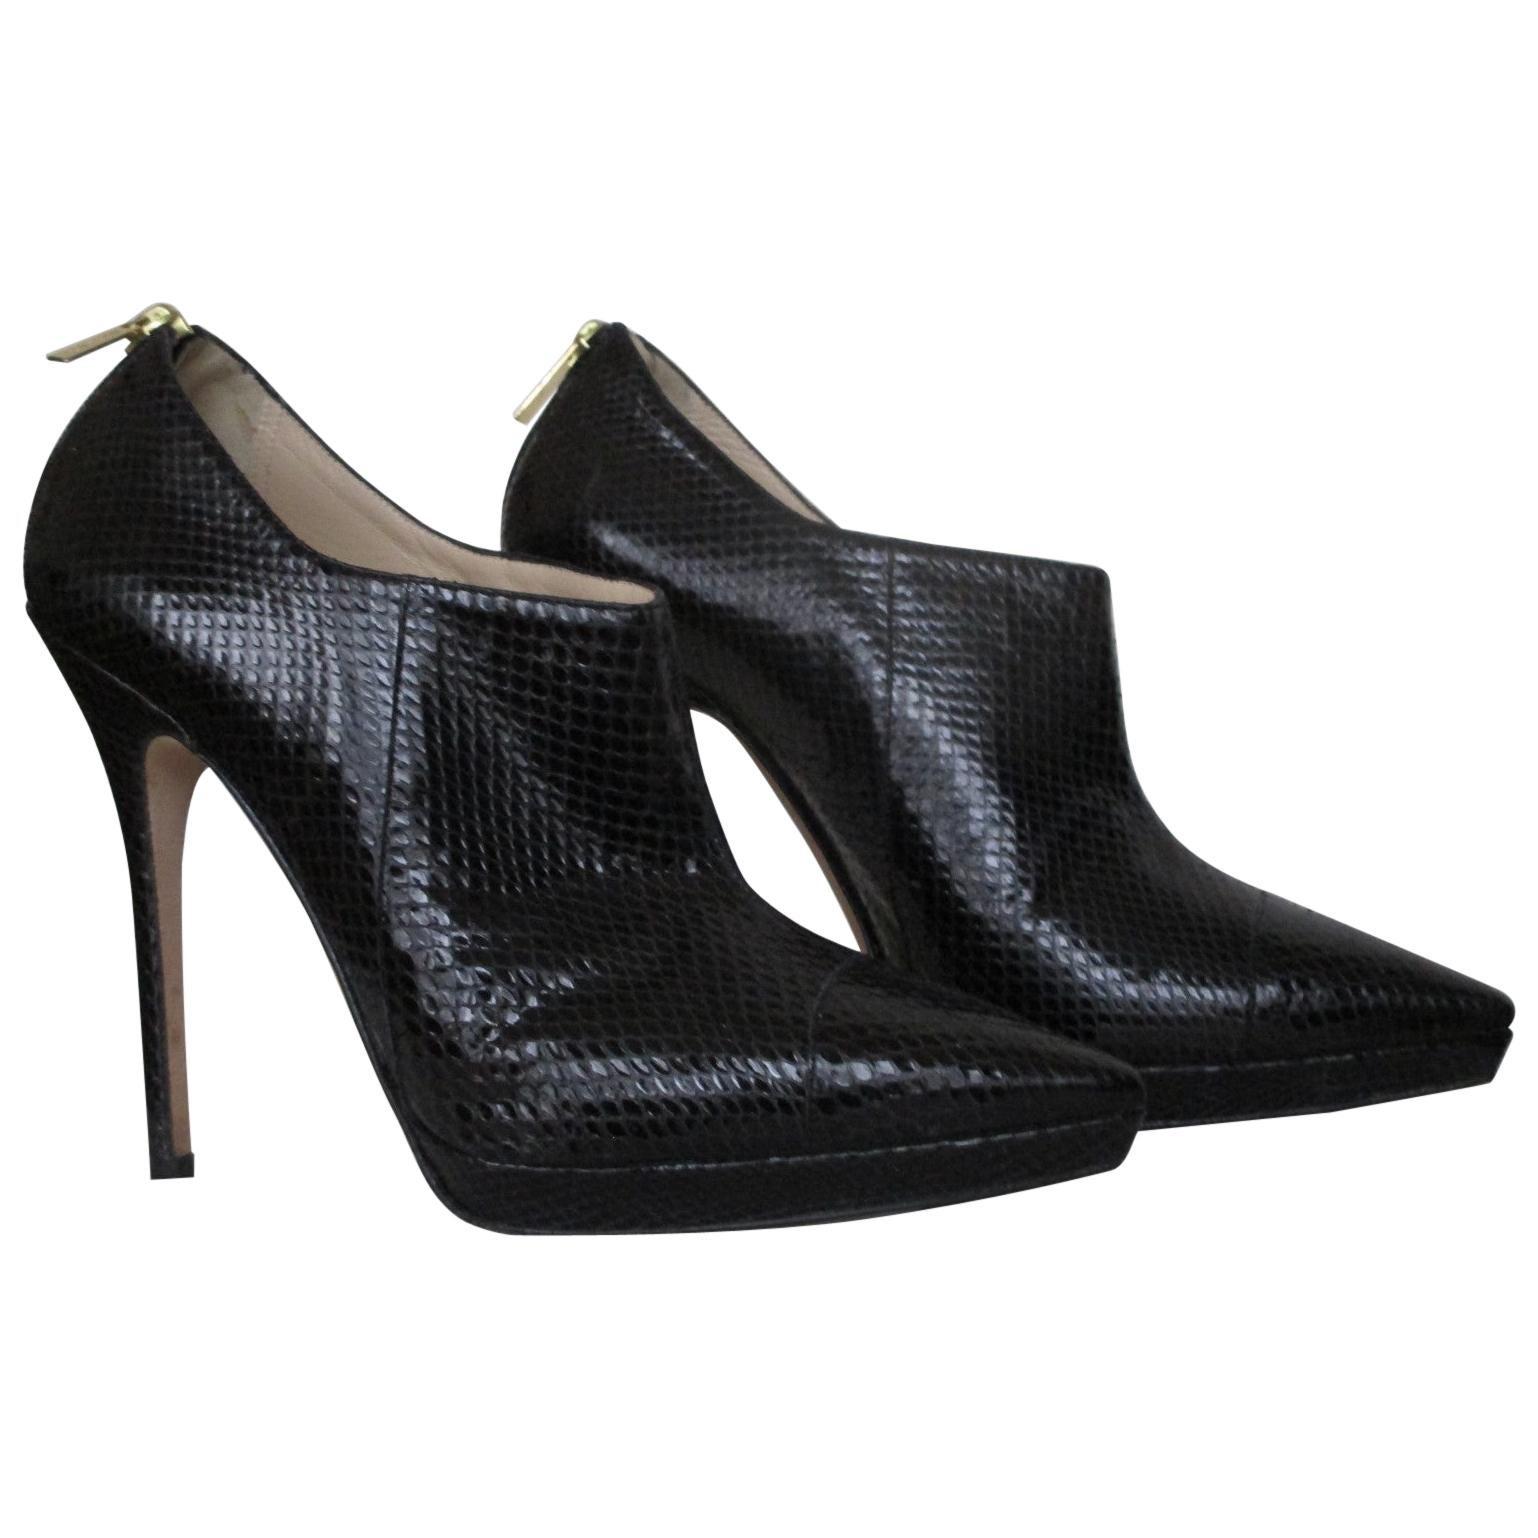 Jimmy Choo Sexy Stiletto Black Python Ankle Boots -us 8